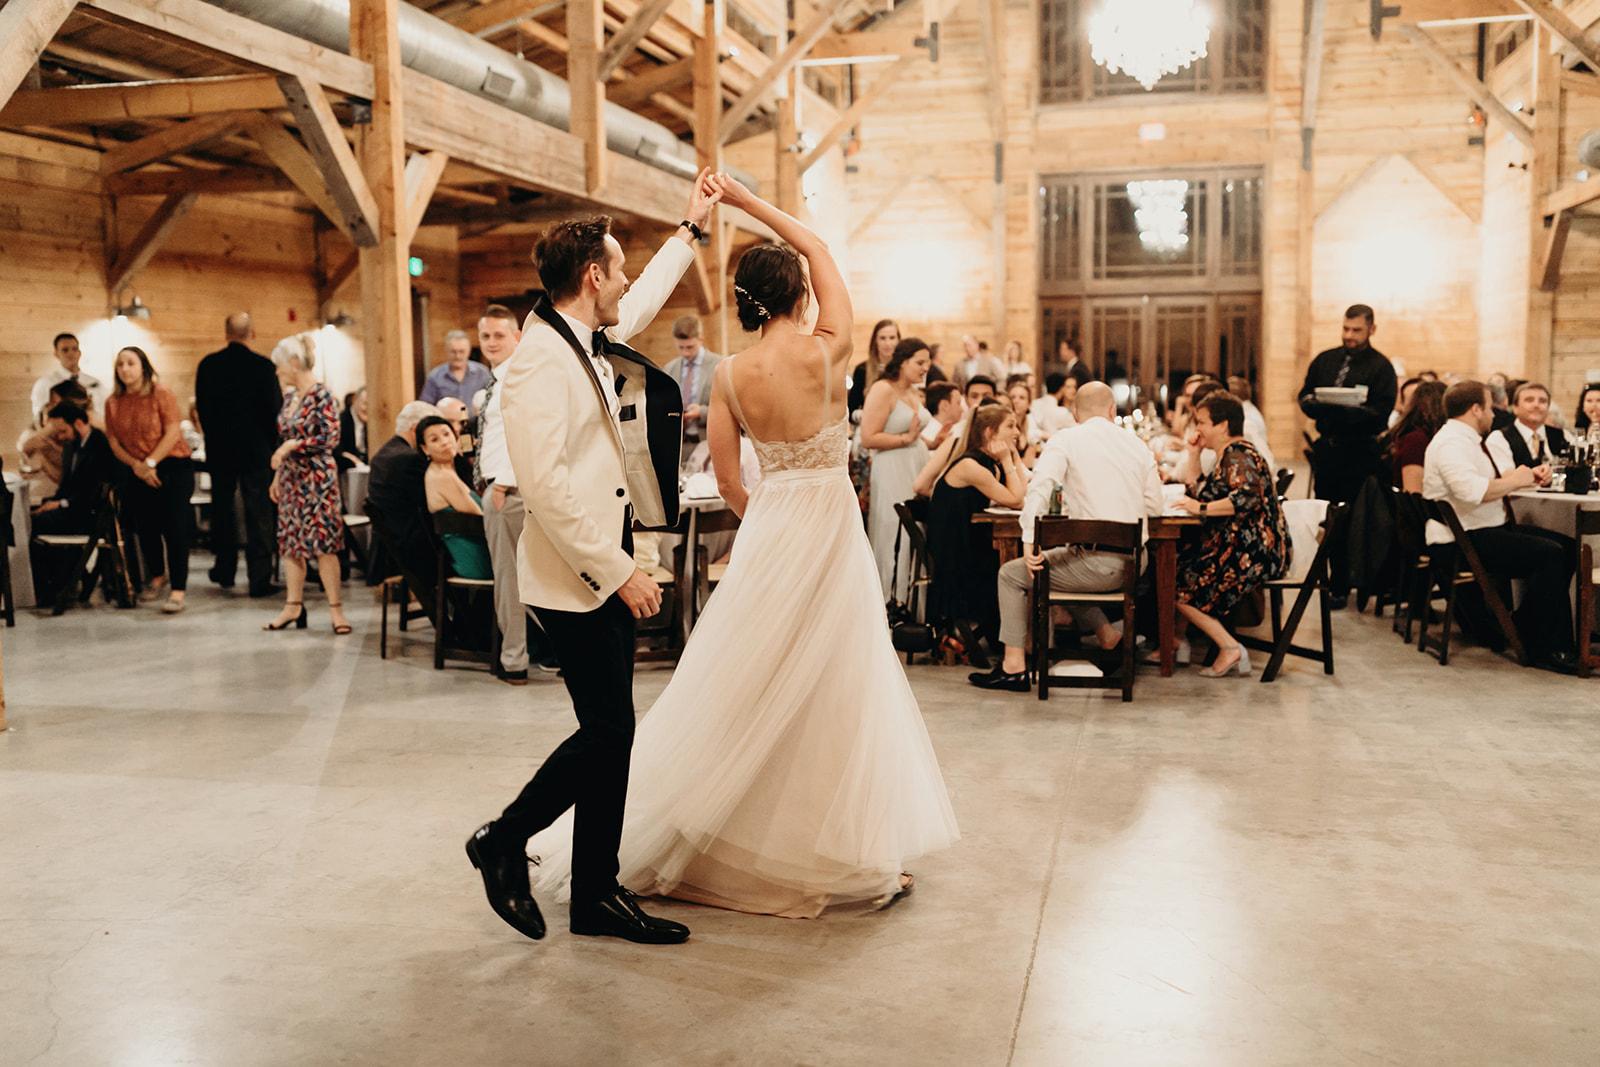 austin-wedding-lindsey-bryce-760.jpg